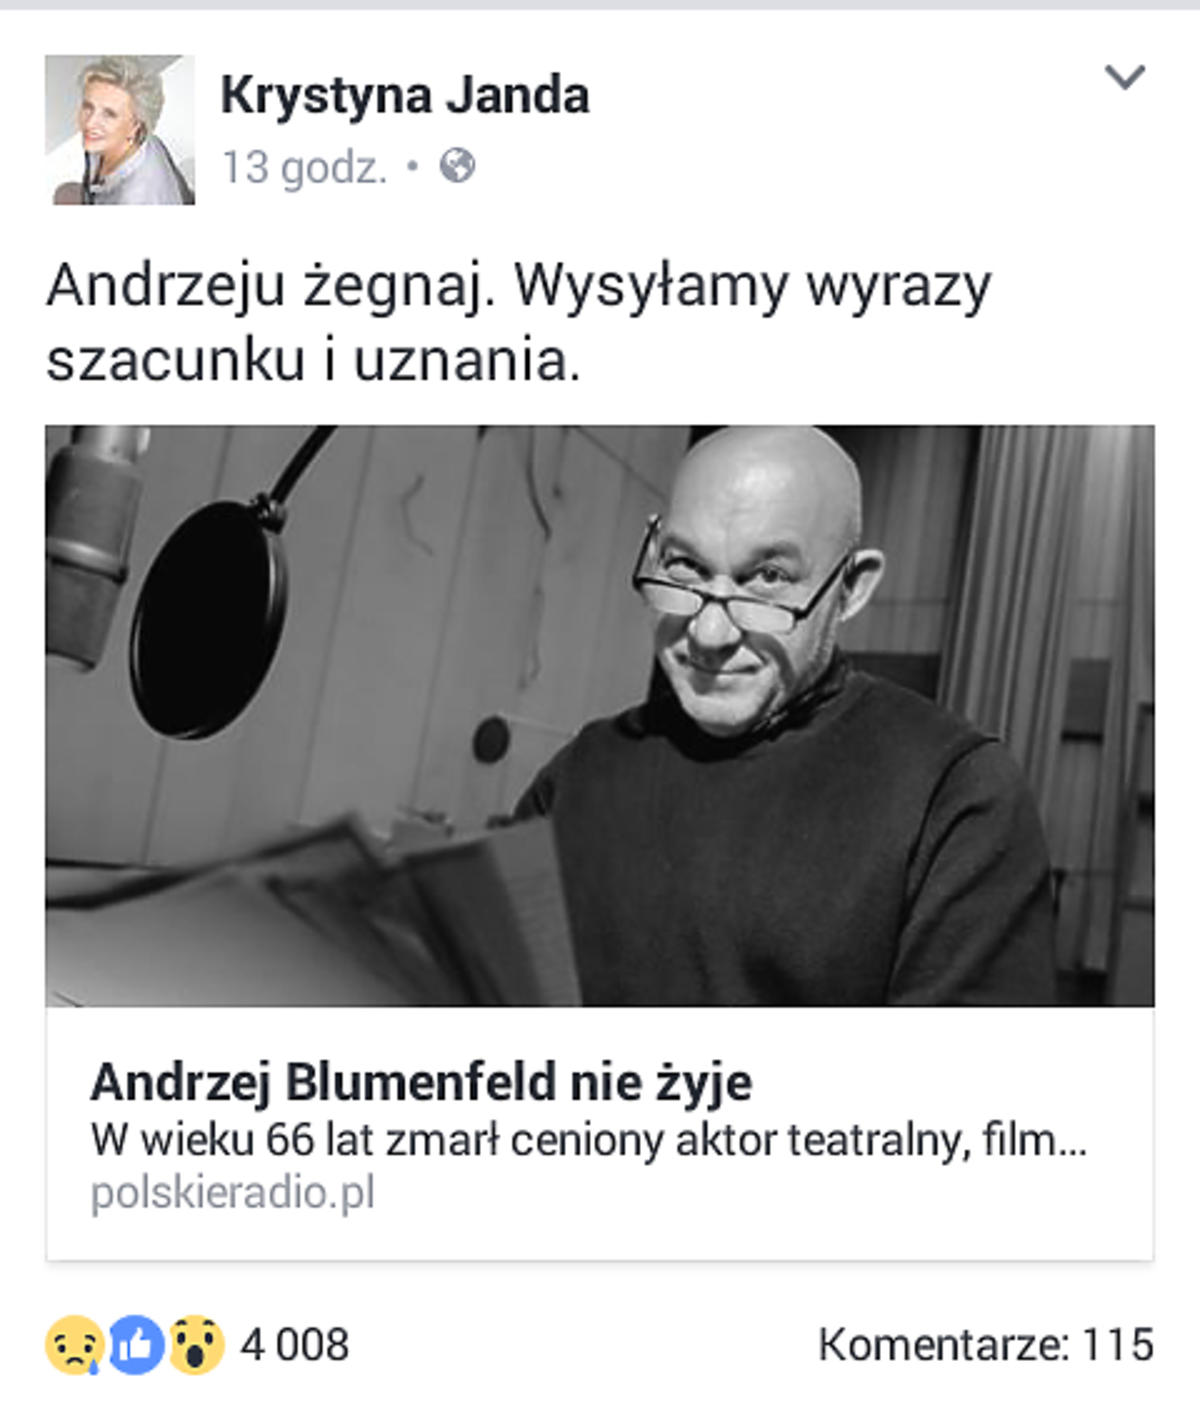 Krystyna Janda żegna Andrzeja Blumenfelda